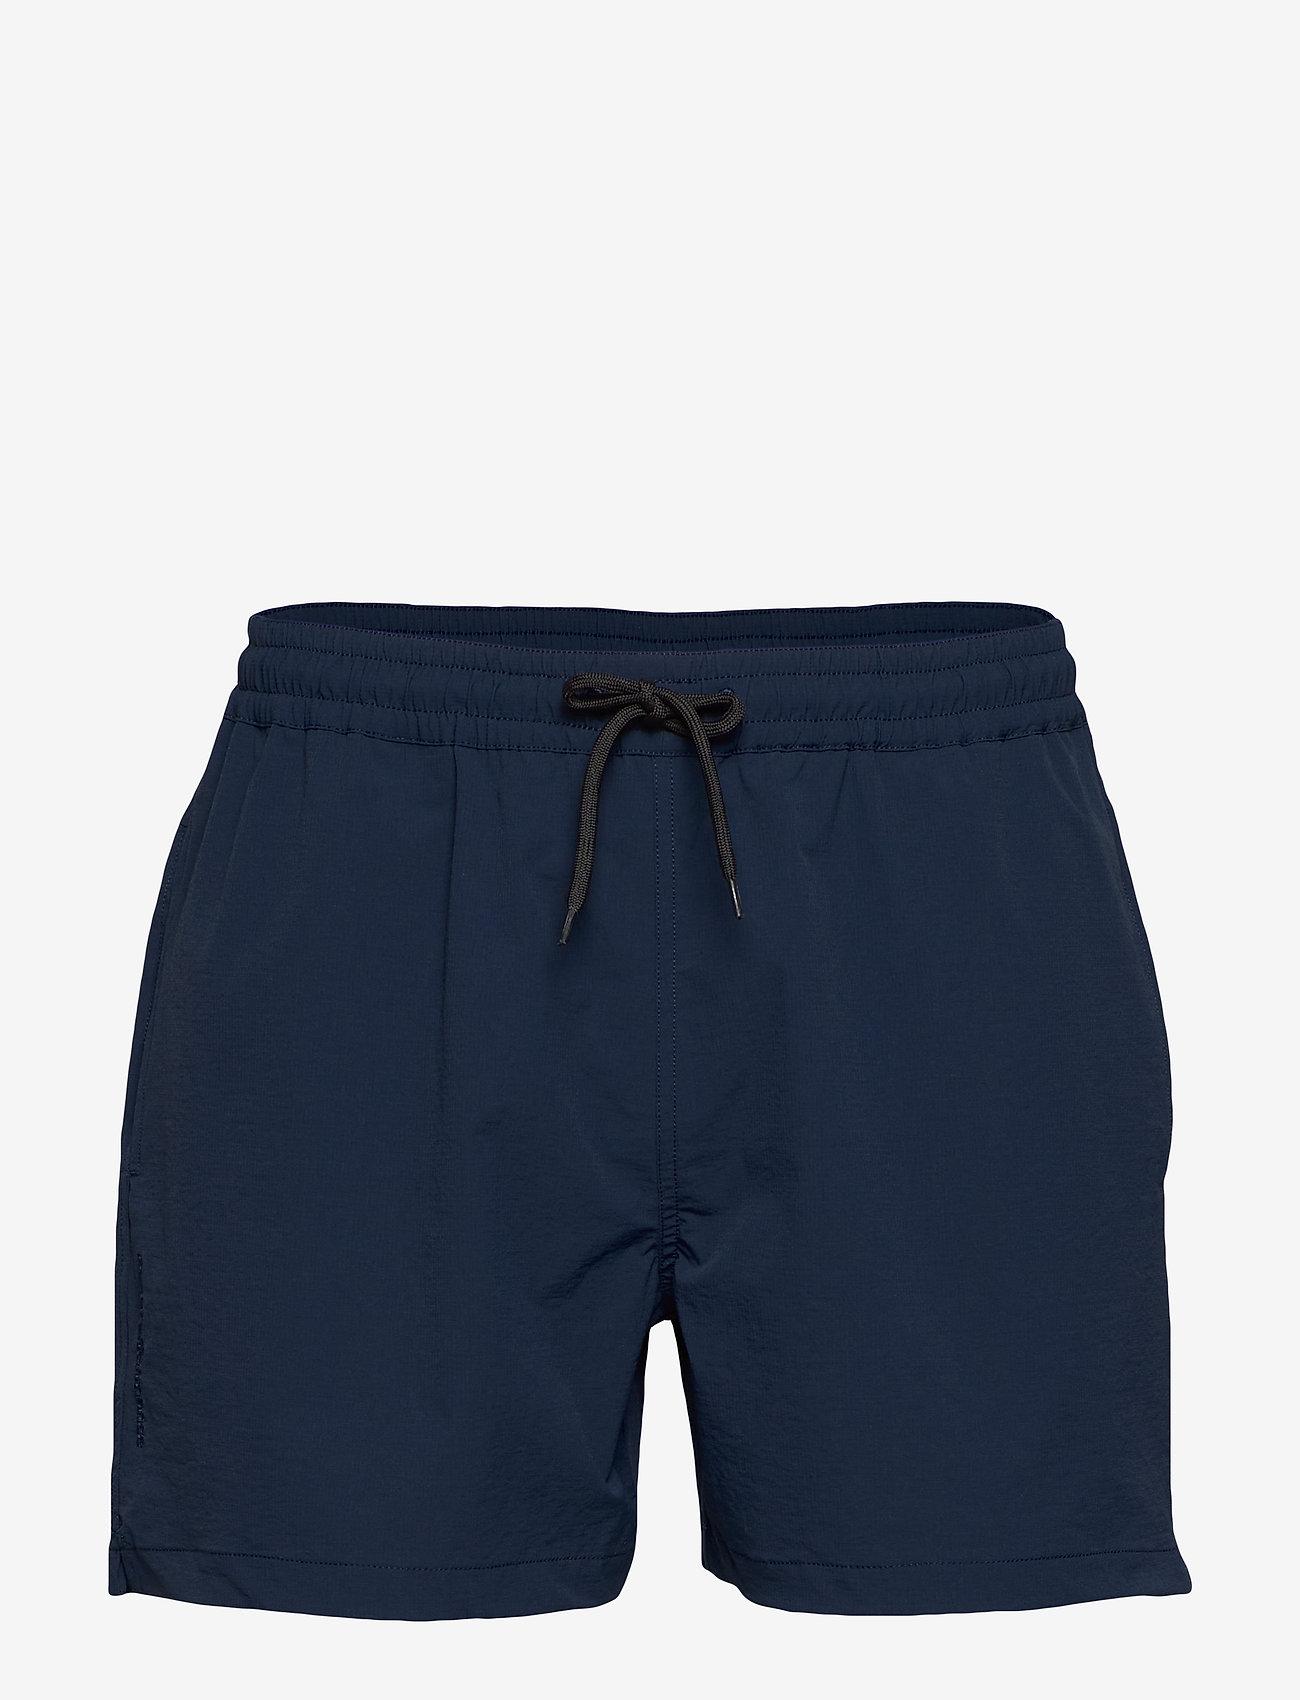 Peak Performance - M Extended Shorts - chaussures de course - blue shadow - 0